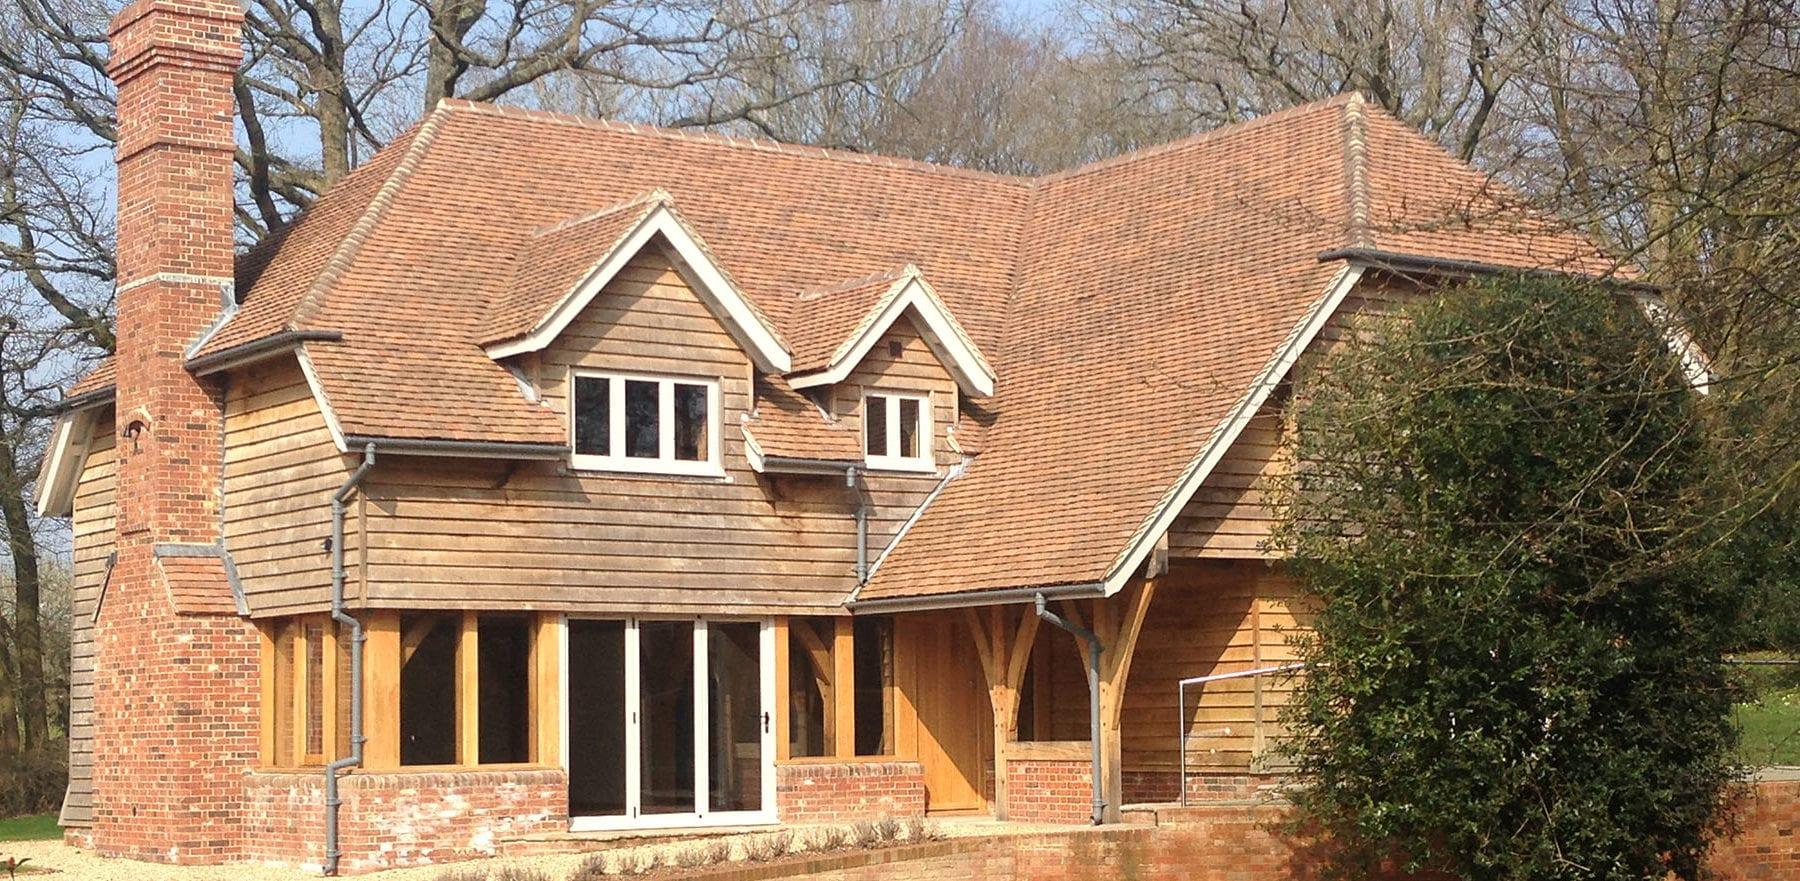 Lifestiles - Handmade Brown Clay Roof Tiles - Cranbrook, England 2